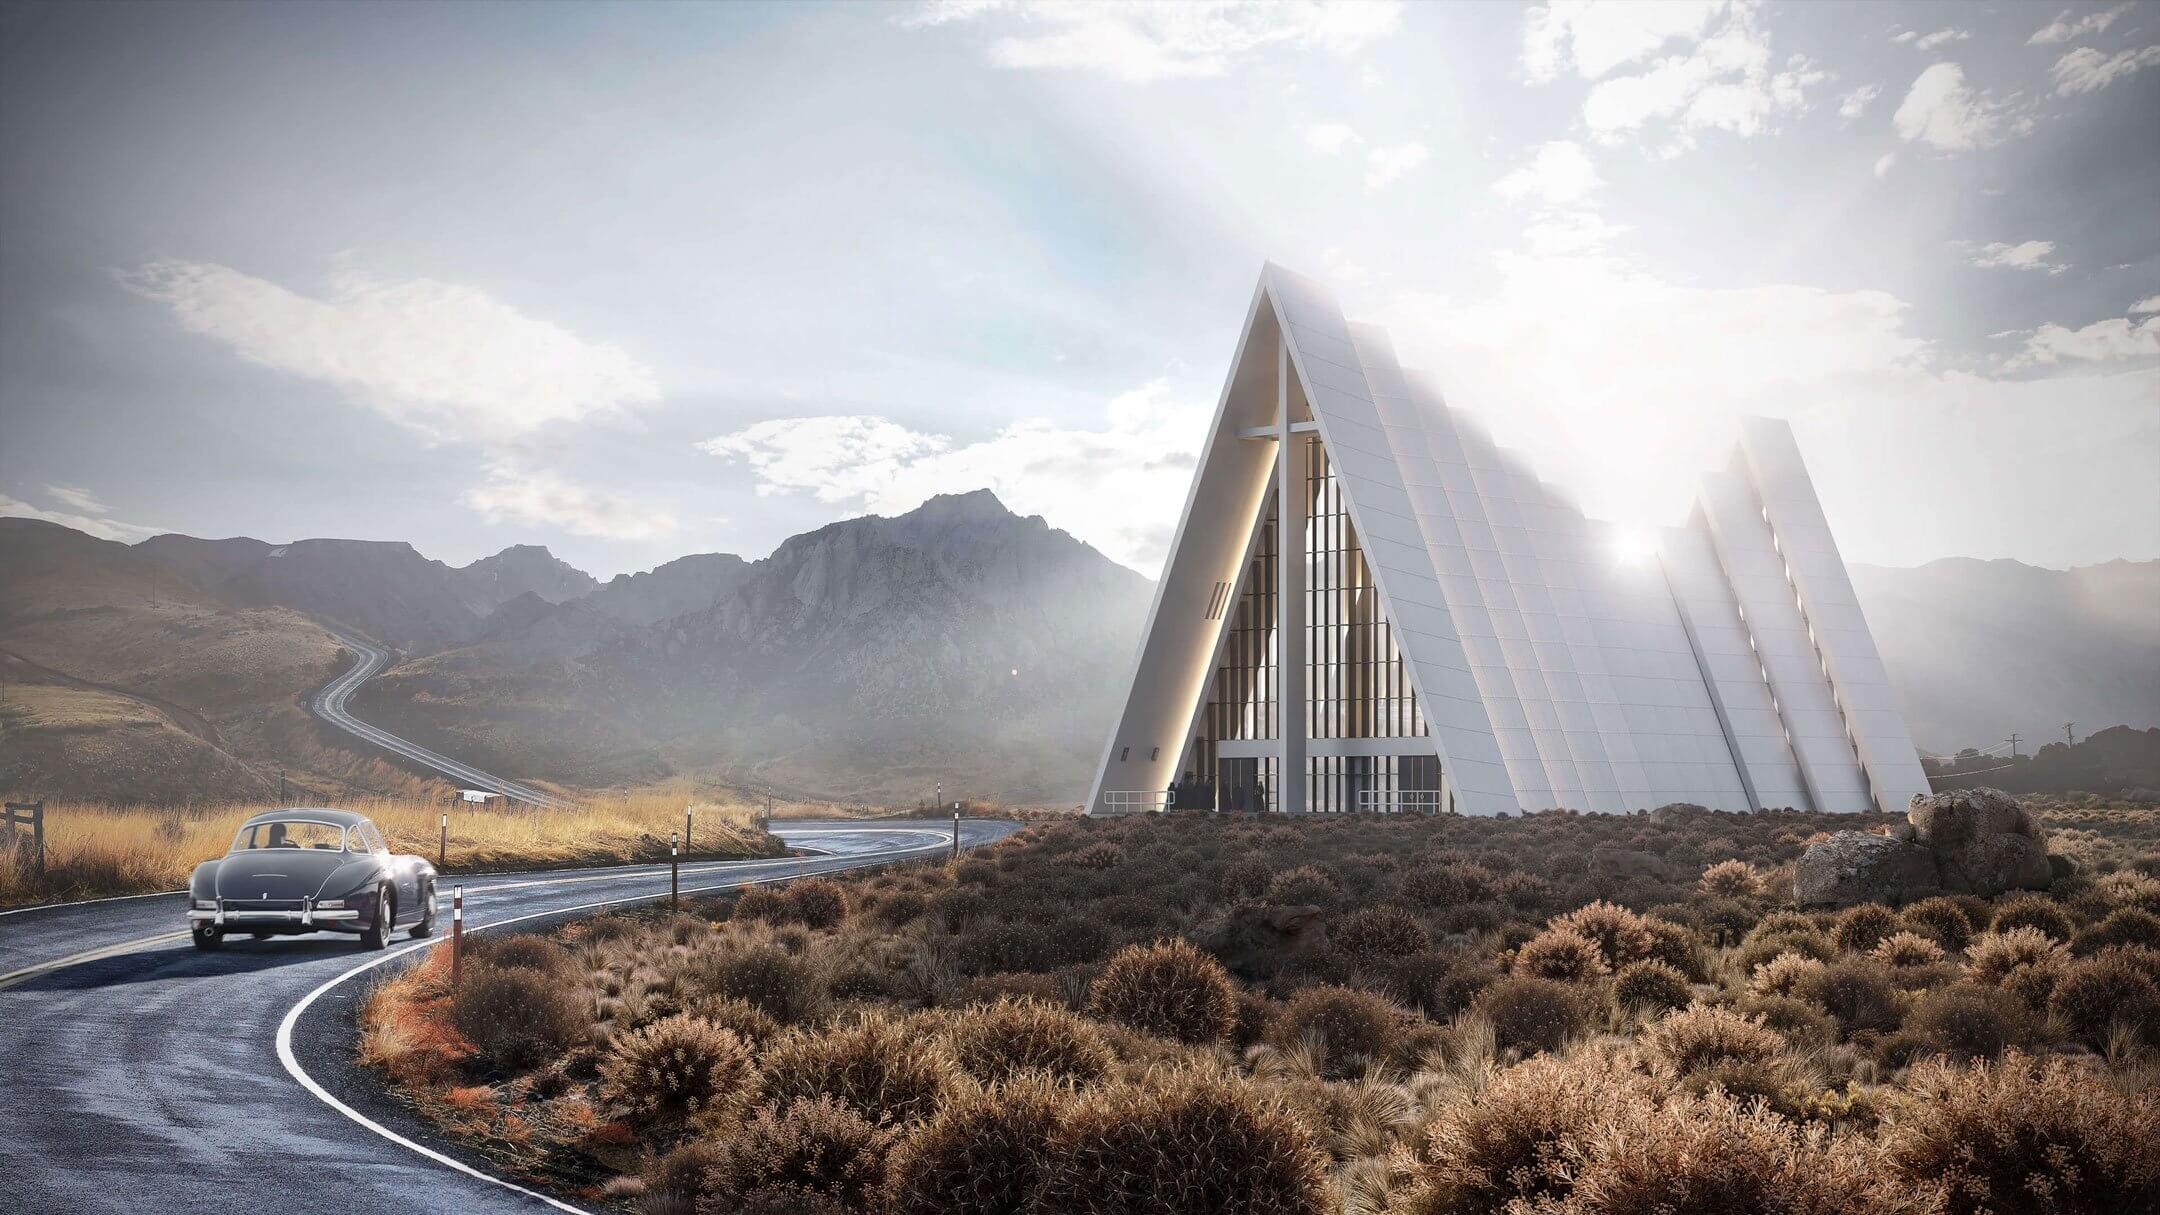 3D Visualization Of A Roadside Church On A Plain